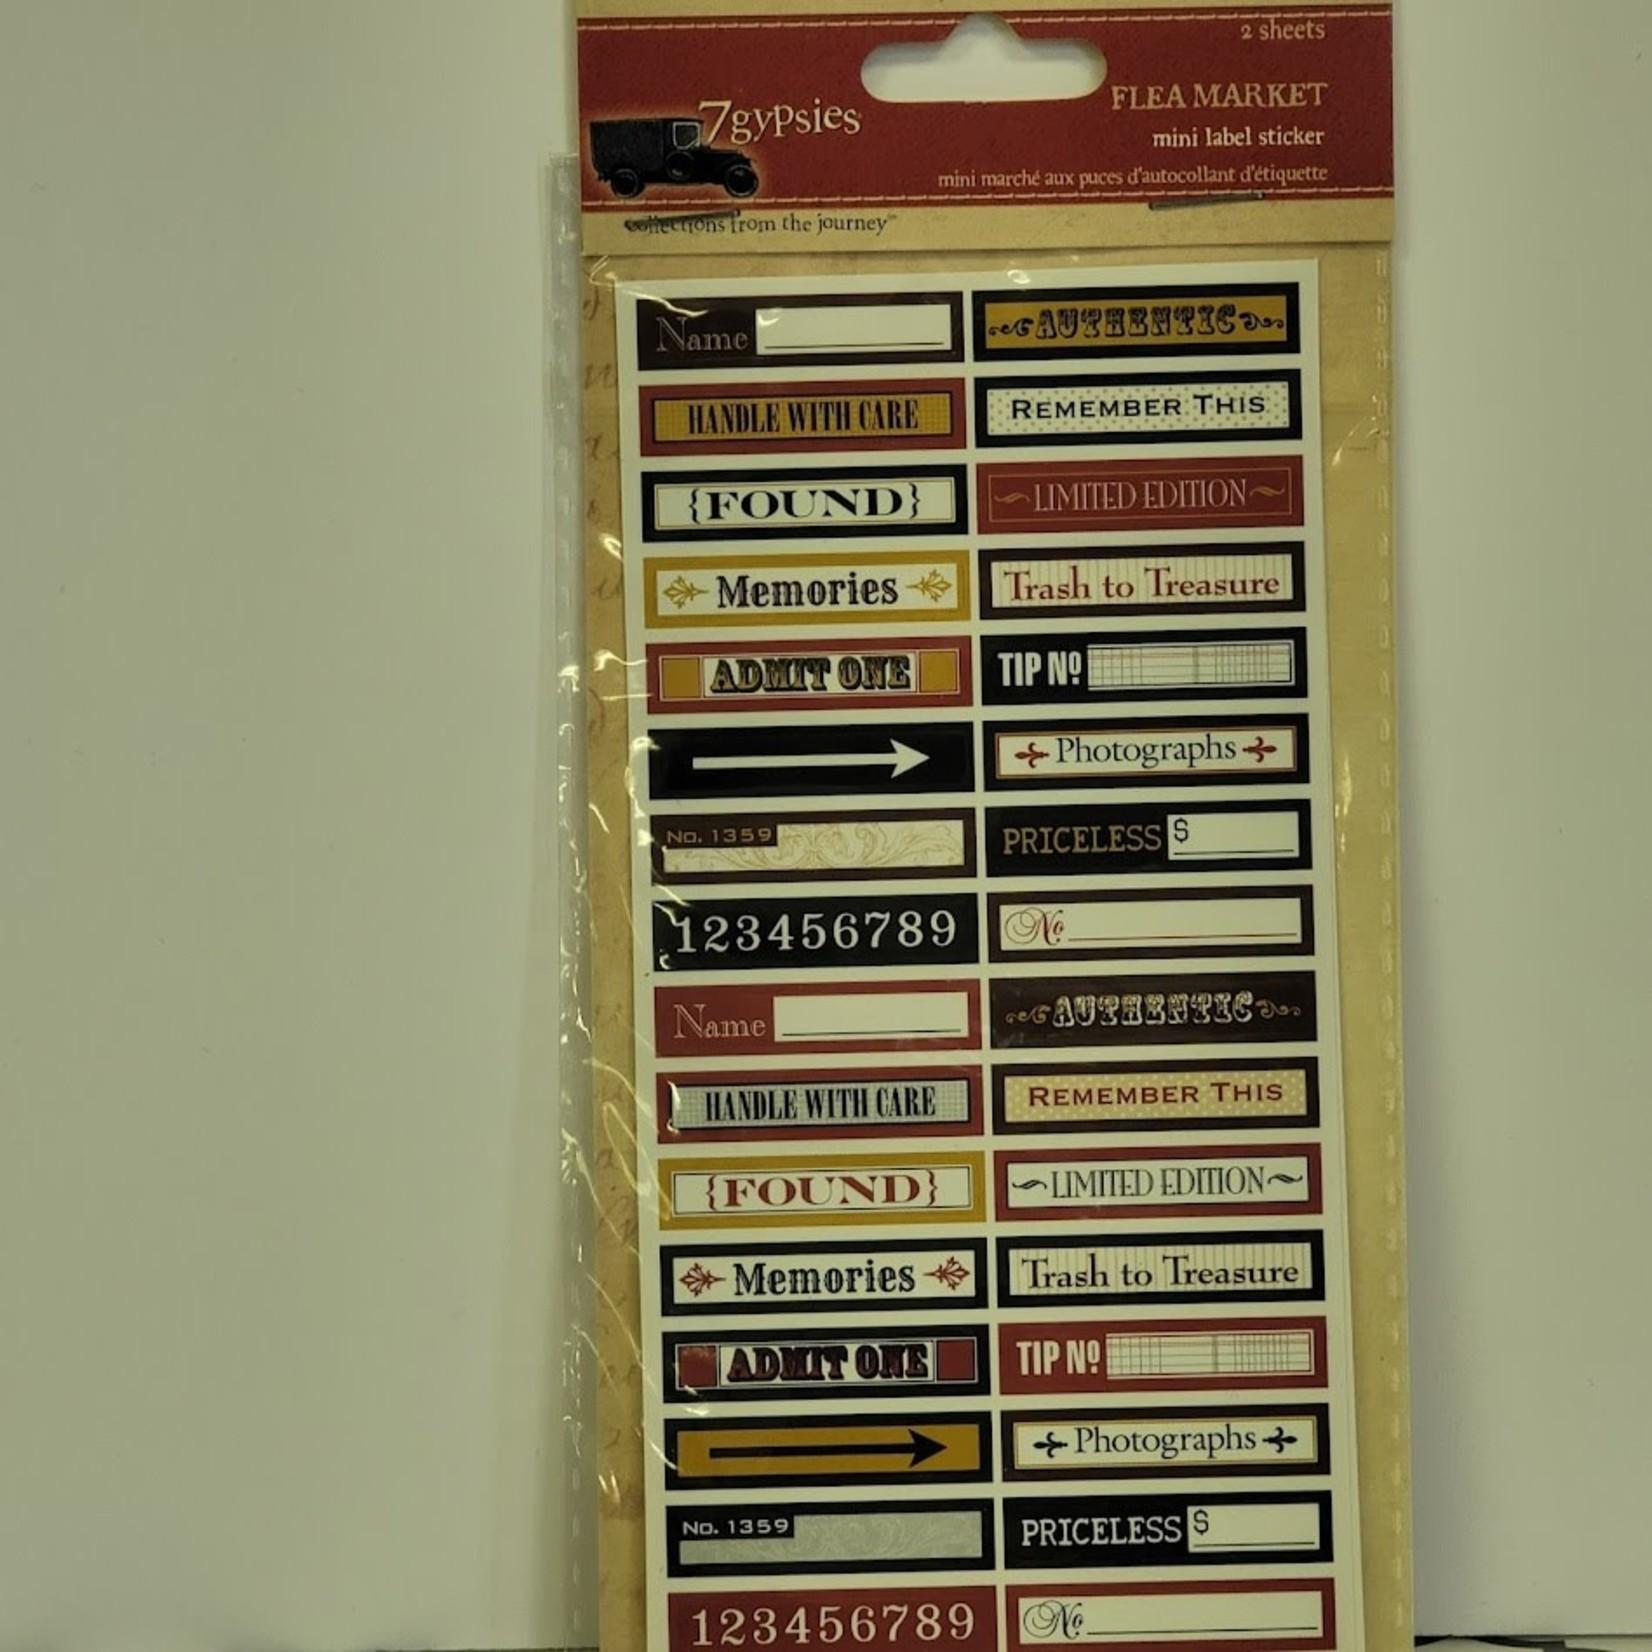 7gypsies - mini label stickers - Flea Market